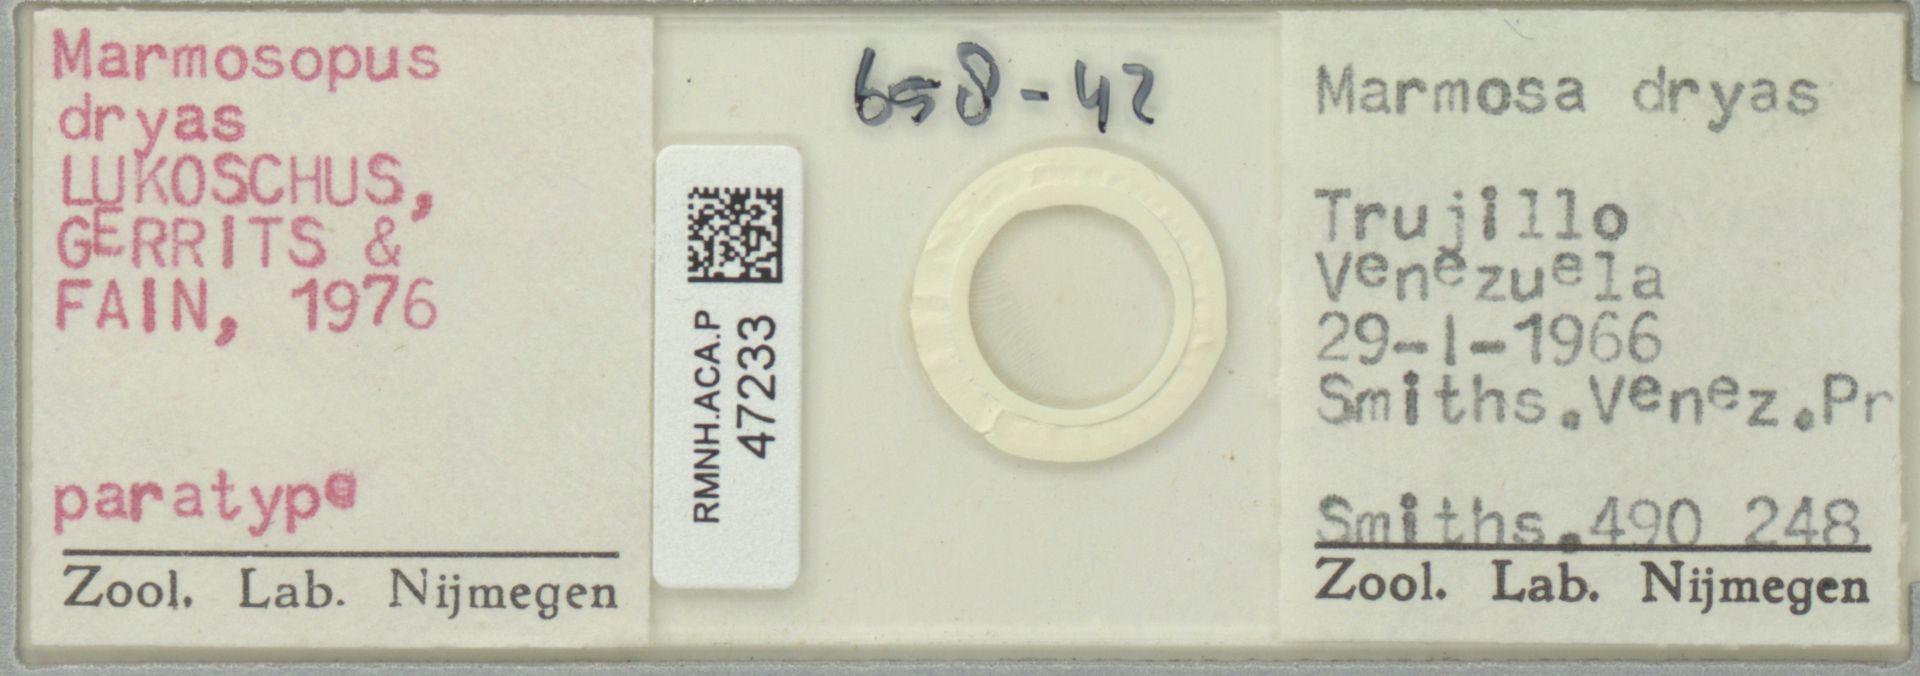 RMNH.ACA.P.47233   Marmosopus dryas Lukoschus, Gerrits & Fain, 1976